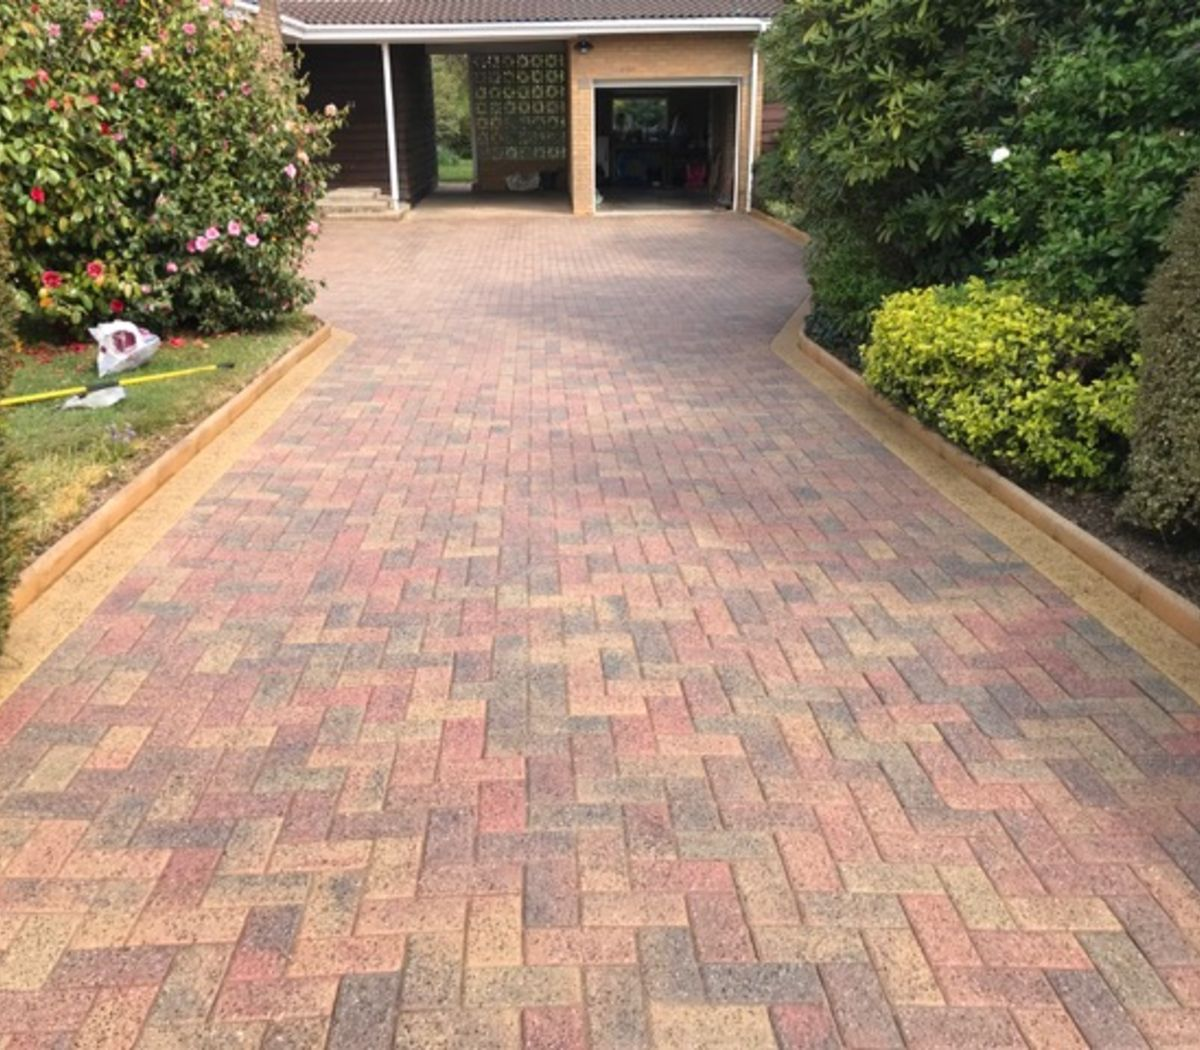 driveway cleaning company llanelli